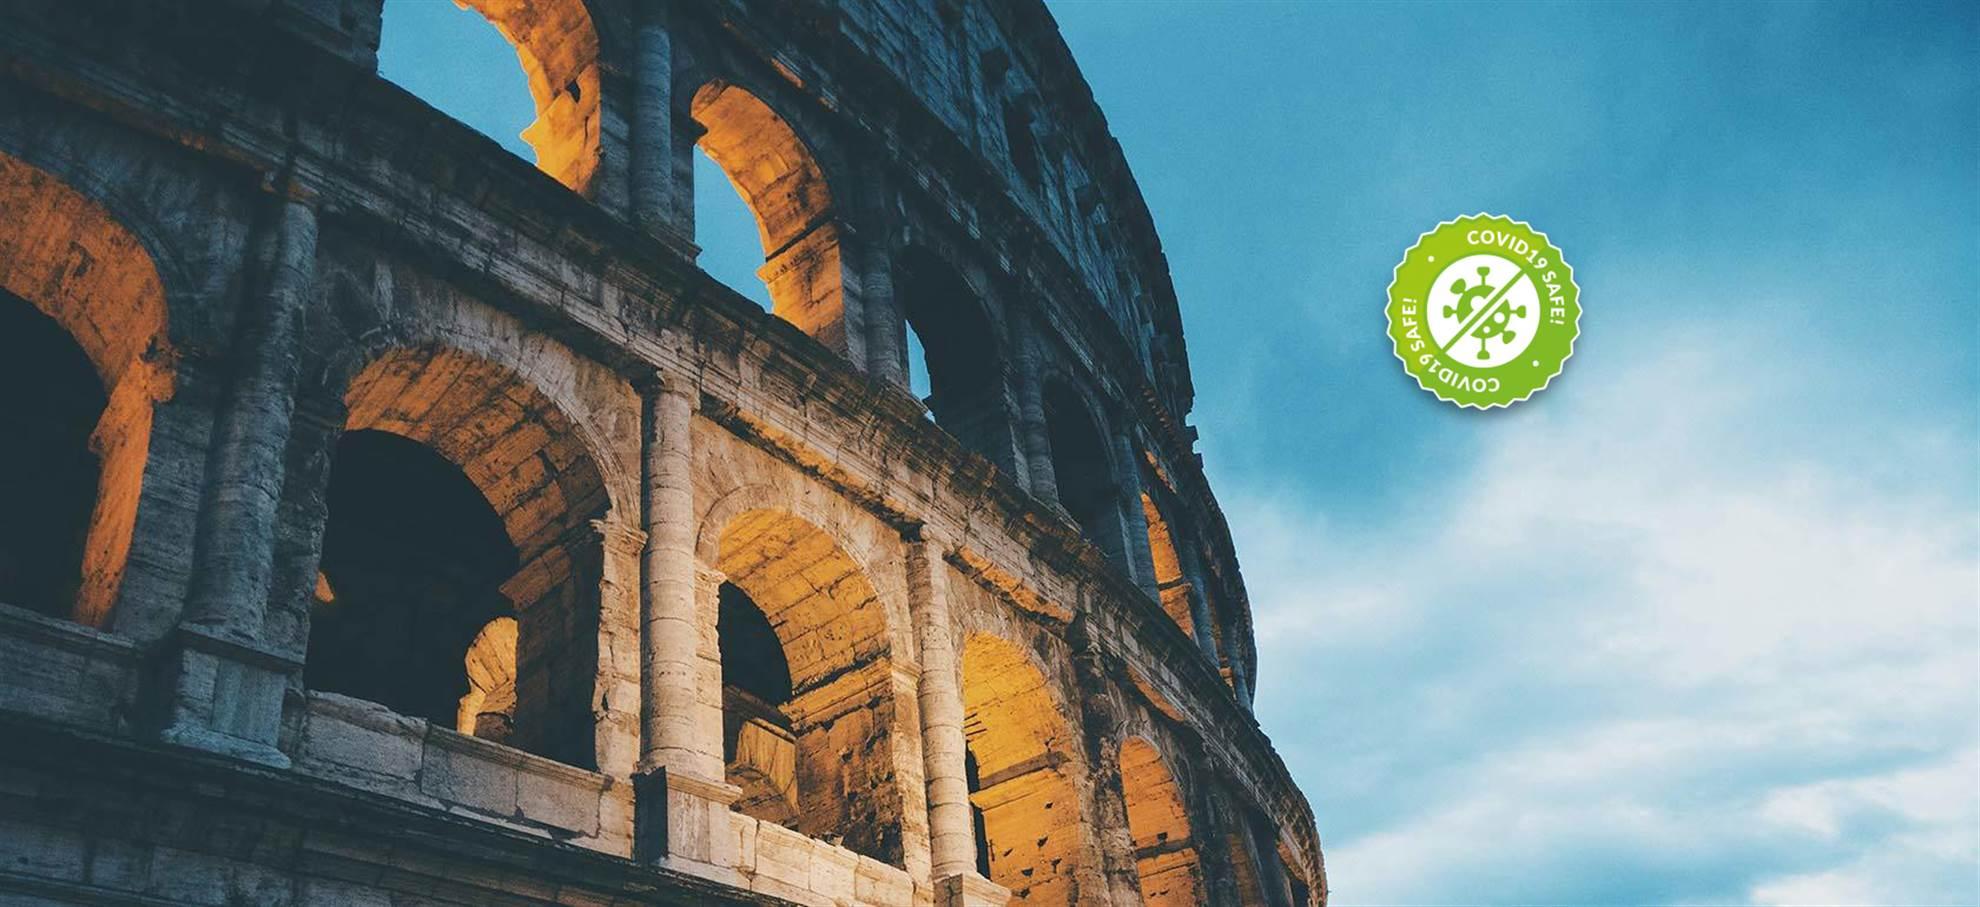 Colosseum - Fast track!